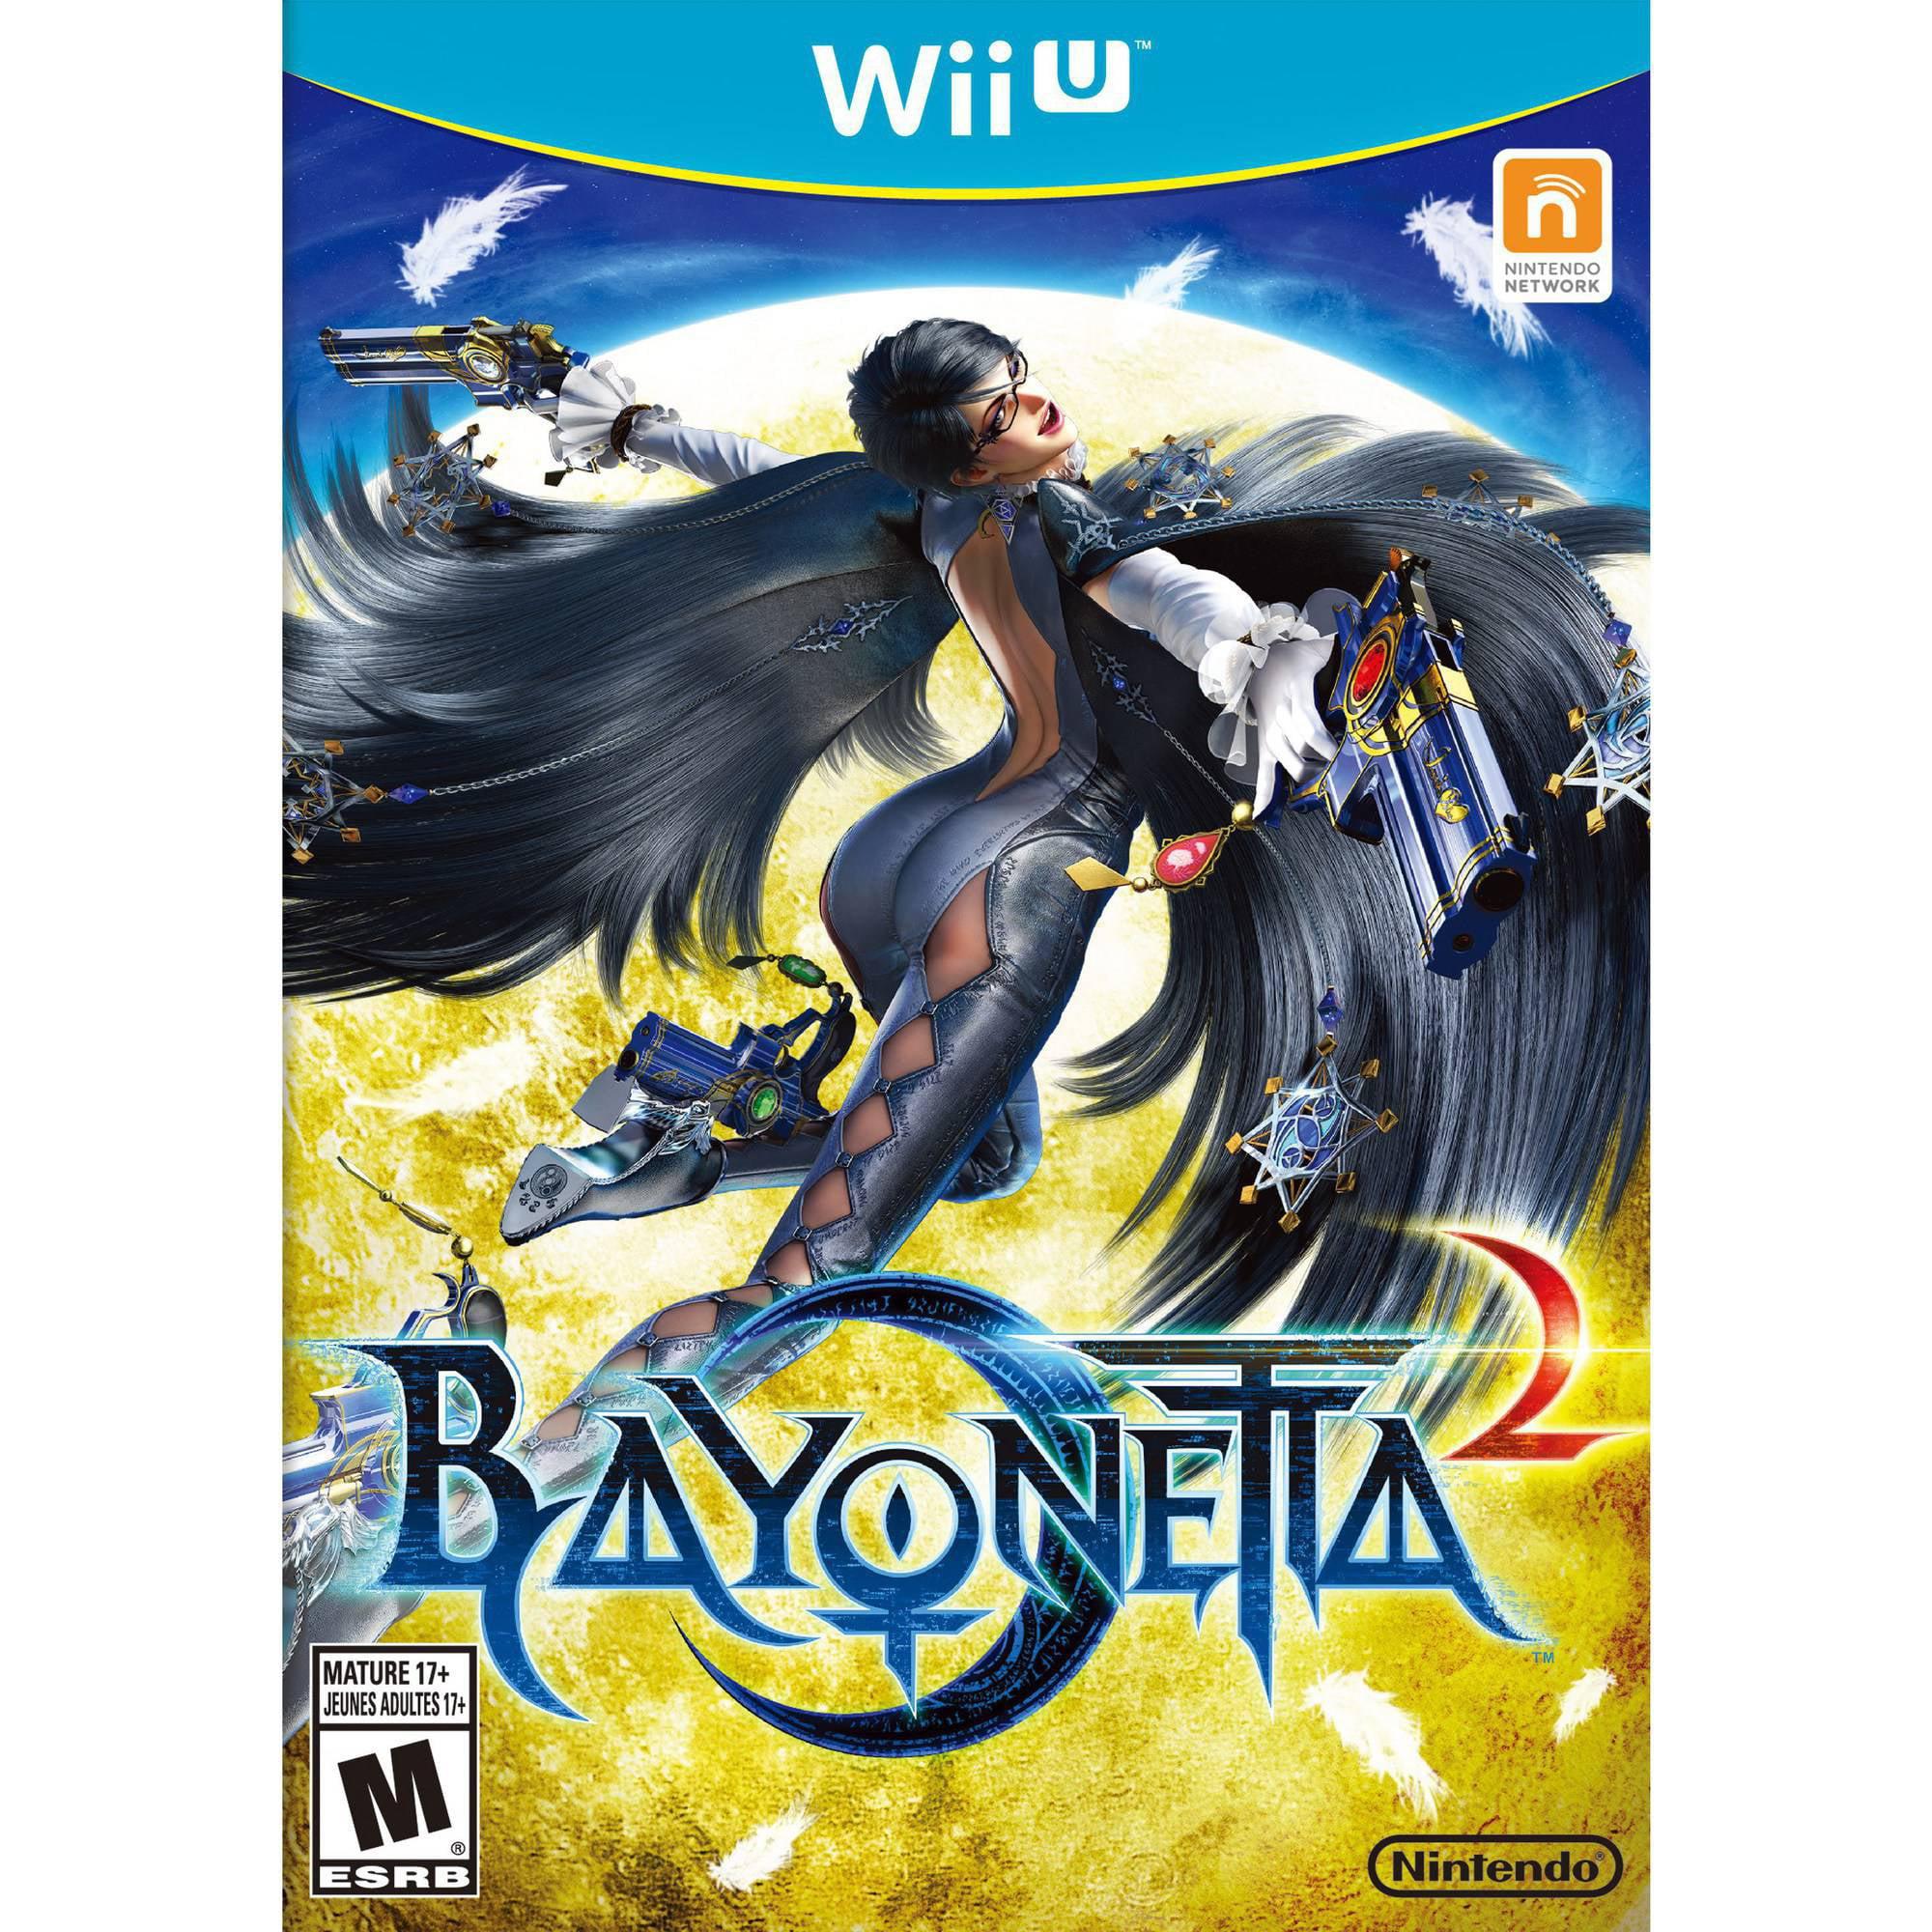 Cokem International Preown Bayonetta 2 Wiiu